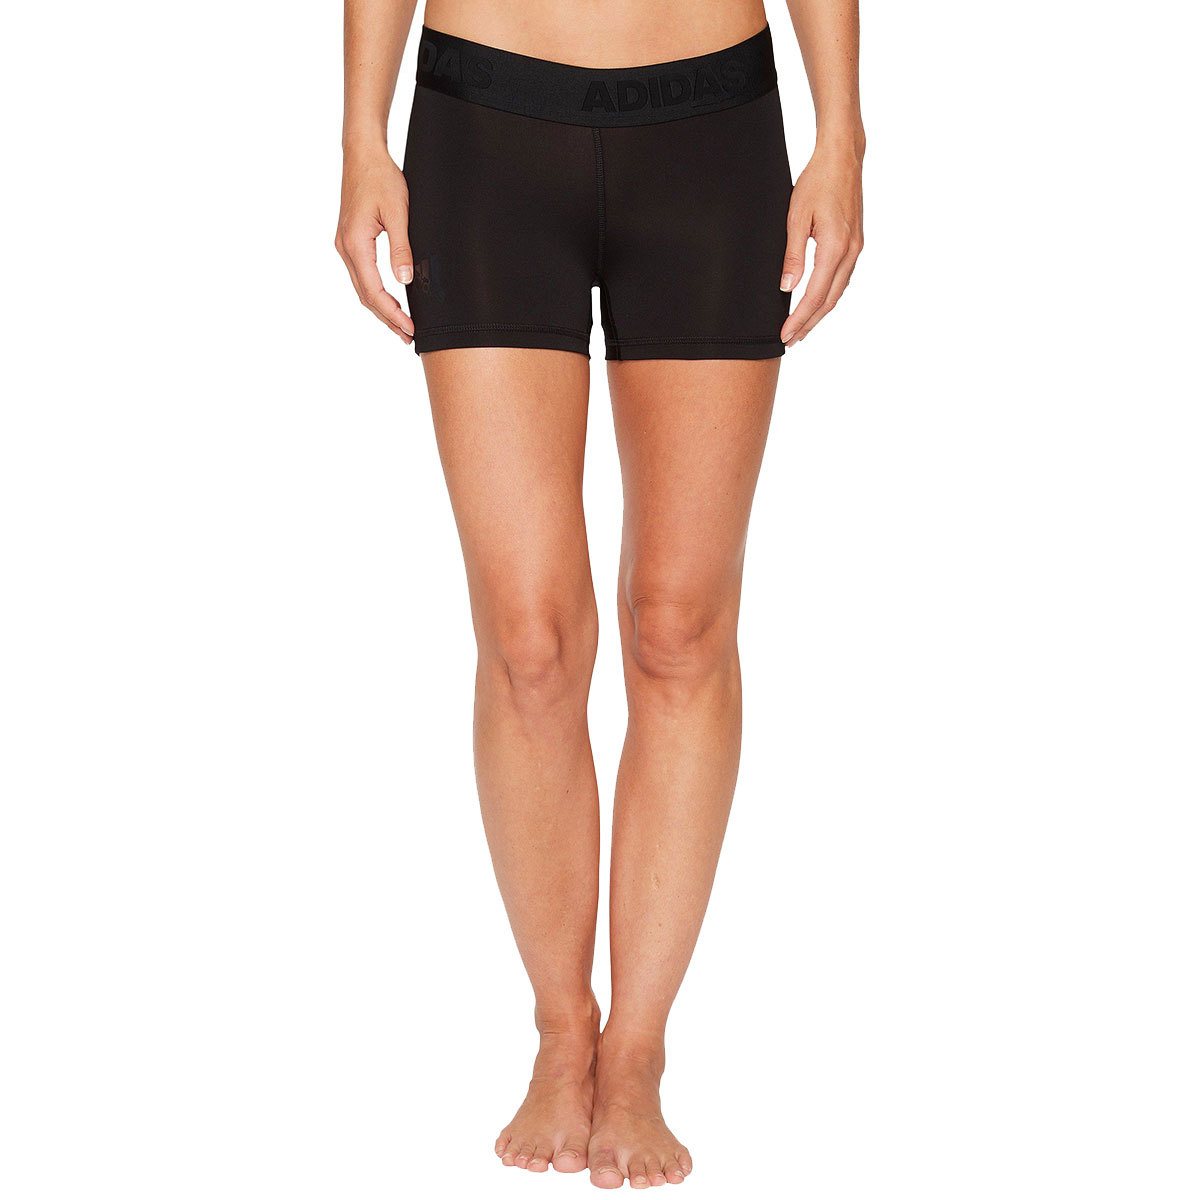 Adidas Women's Alphaskin Sport Short Tights - Black, XL